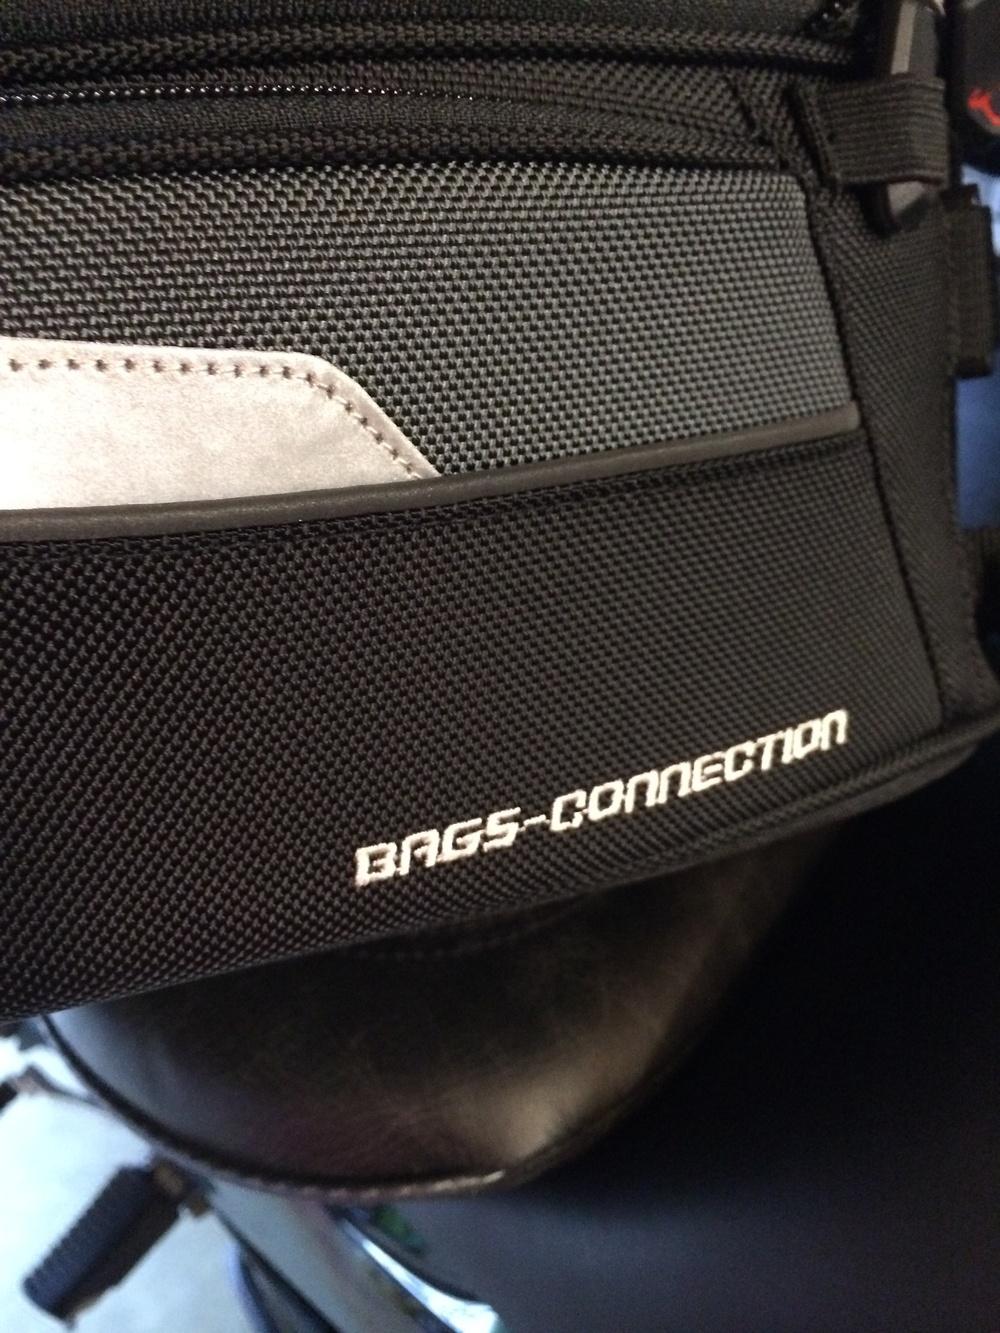 Bag Name.JPG